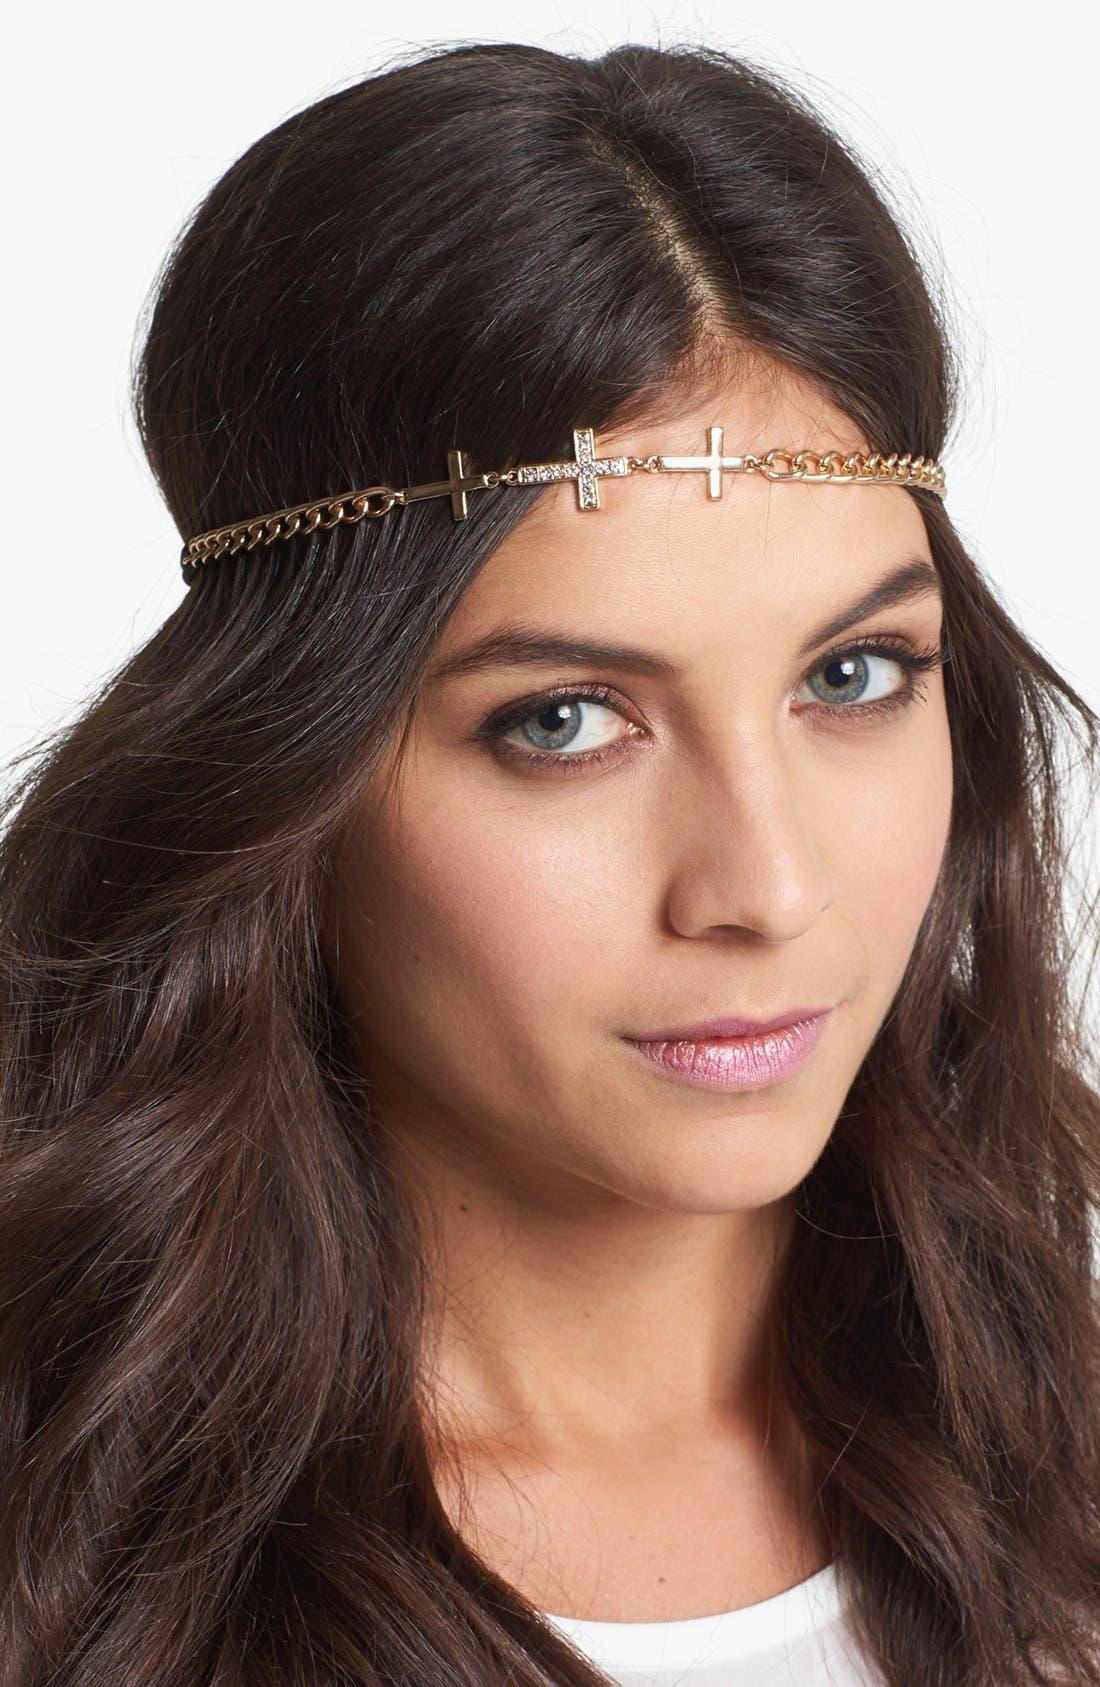 Alternate Image 1 Selected - Tasha 'Cross' Chain Head Wrap